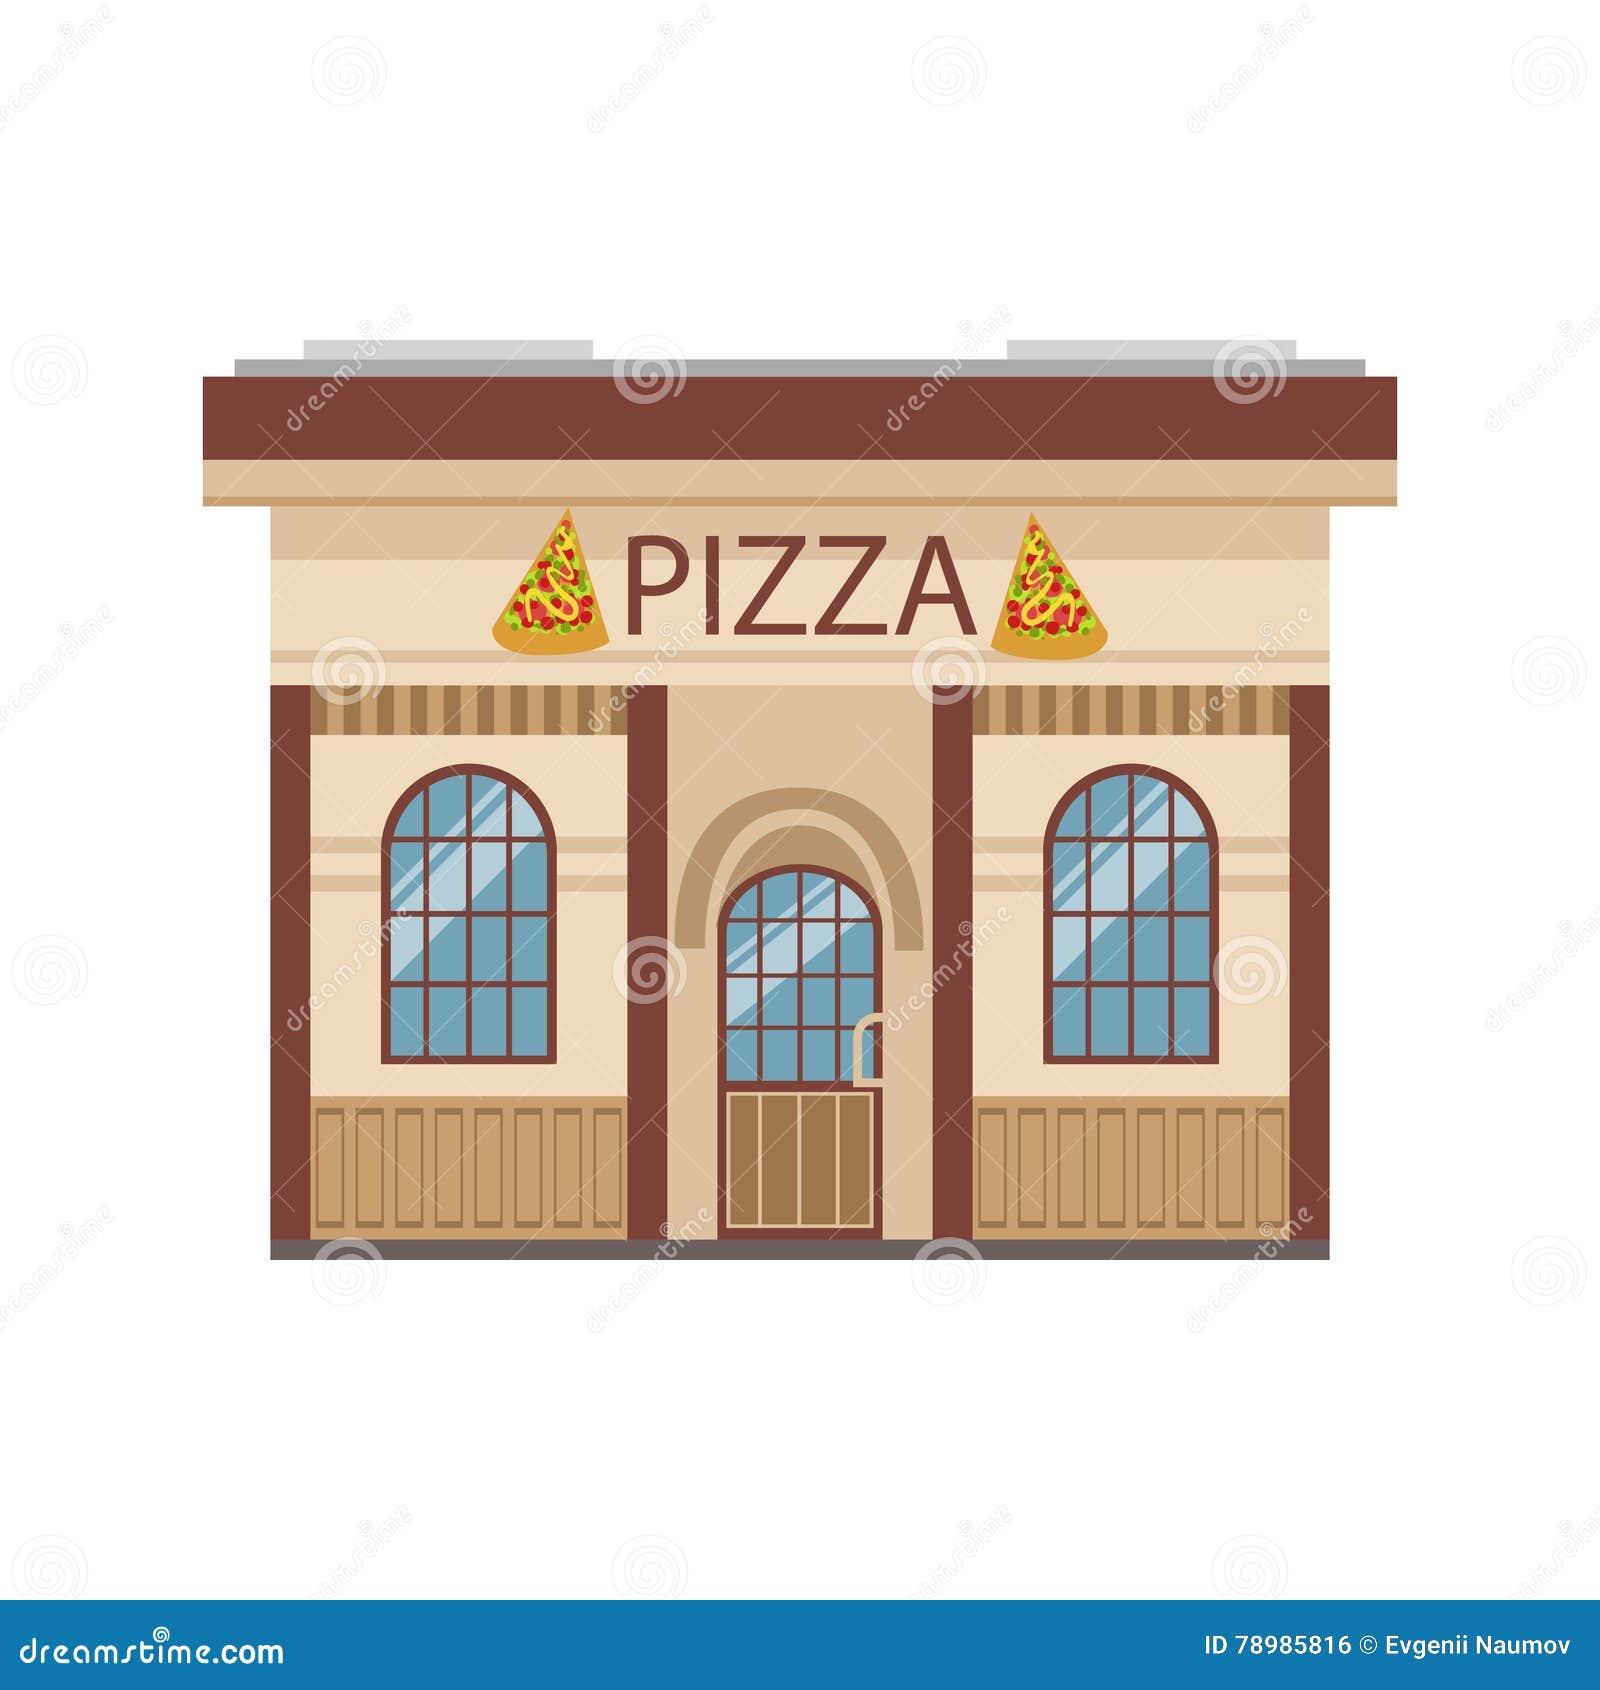 Building cartoon clipart restaurant building and restaurant building - Royalty Free Vector Download Pizza Restaurant Commercial Building